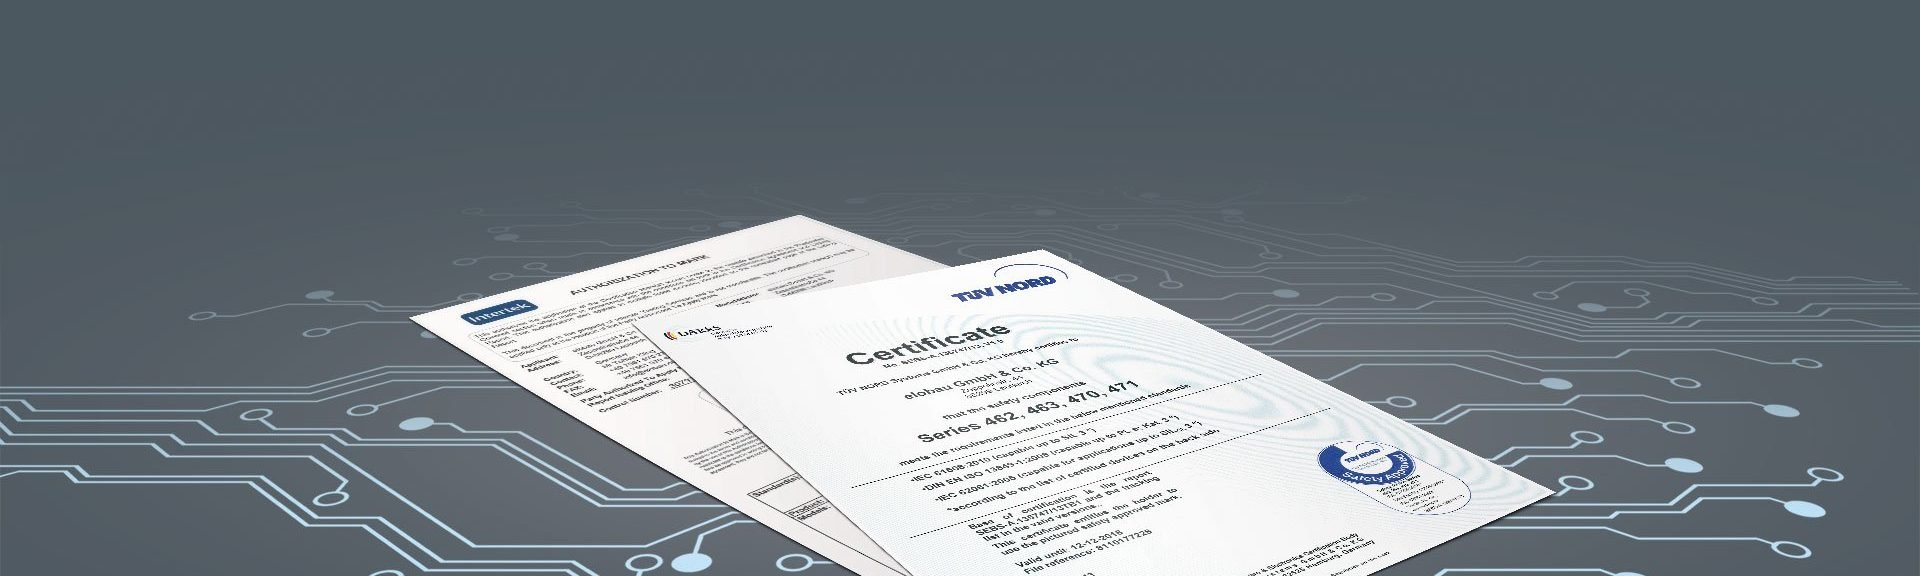 Zertifikate Füllstandsmessung